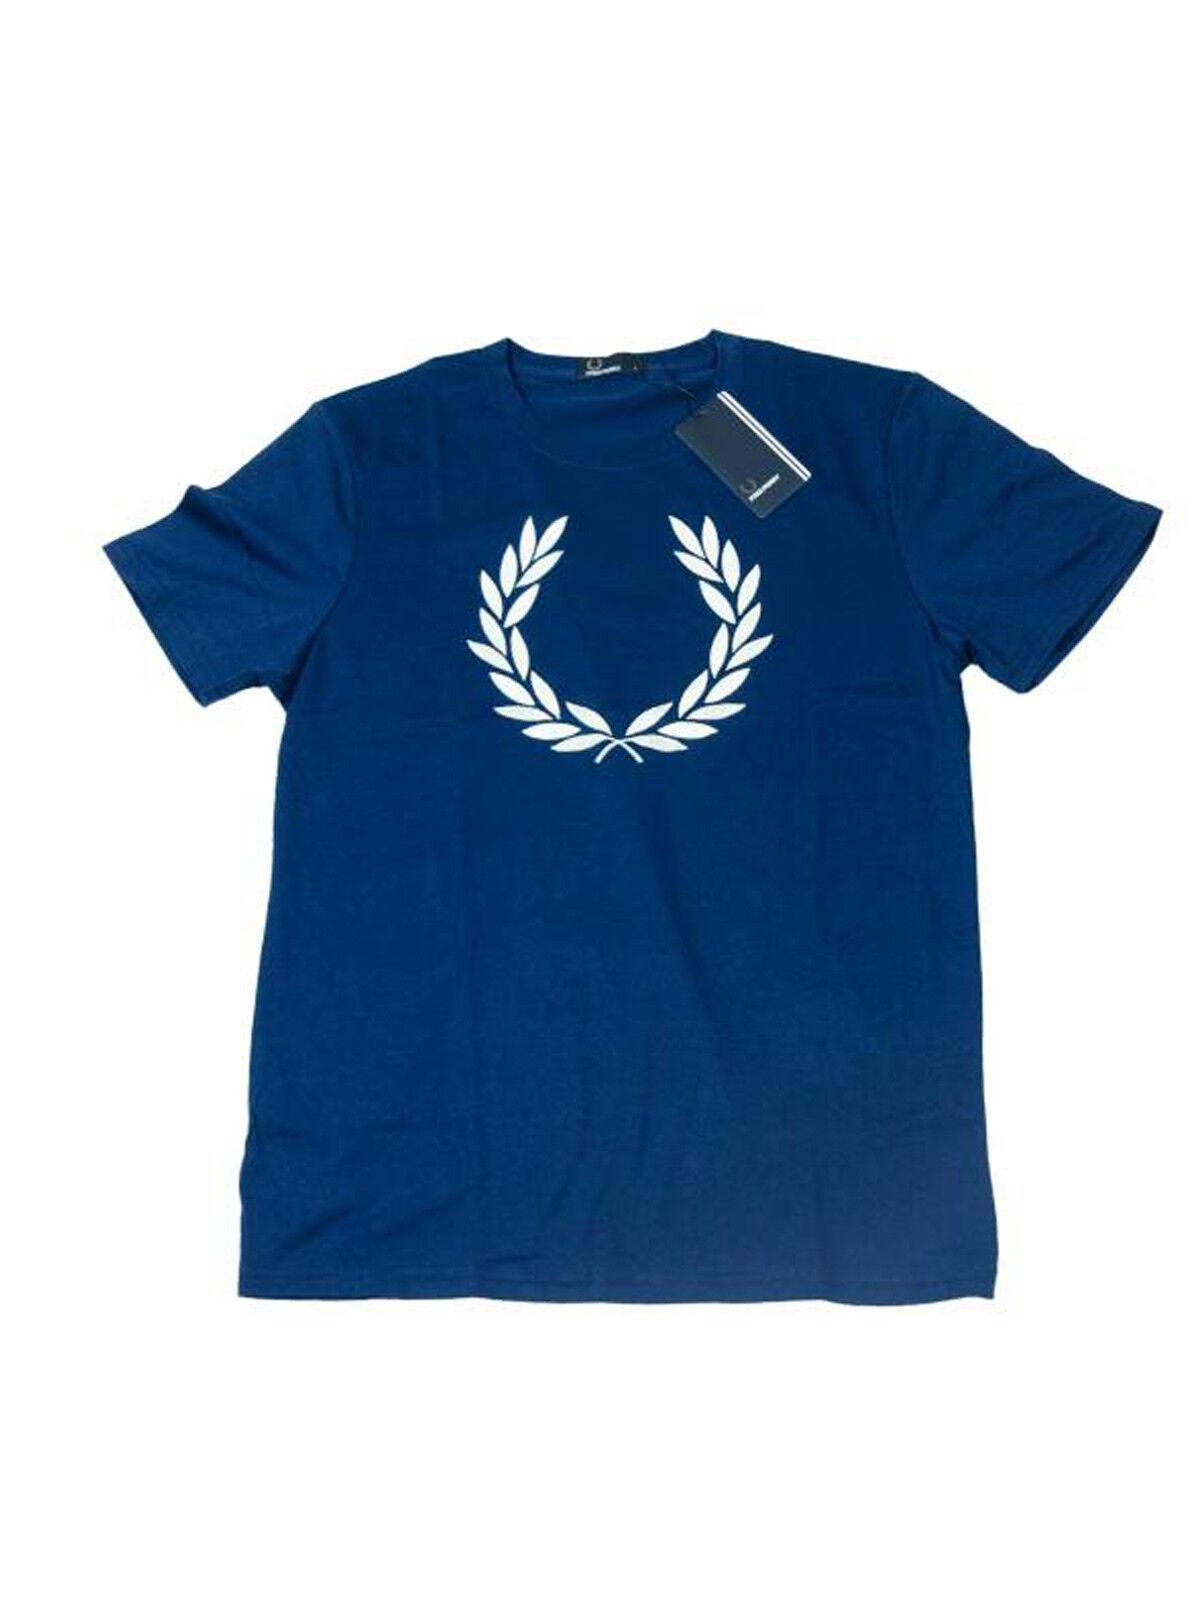 Frot Perry T-Shirt Navy Lorbeer gestickt M7259 143  5720